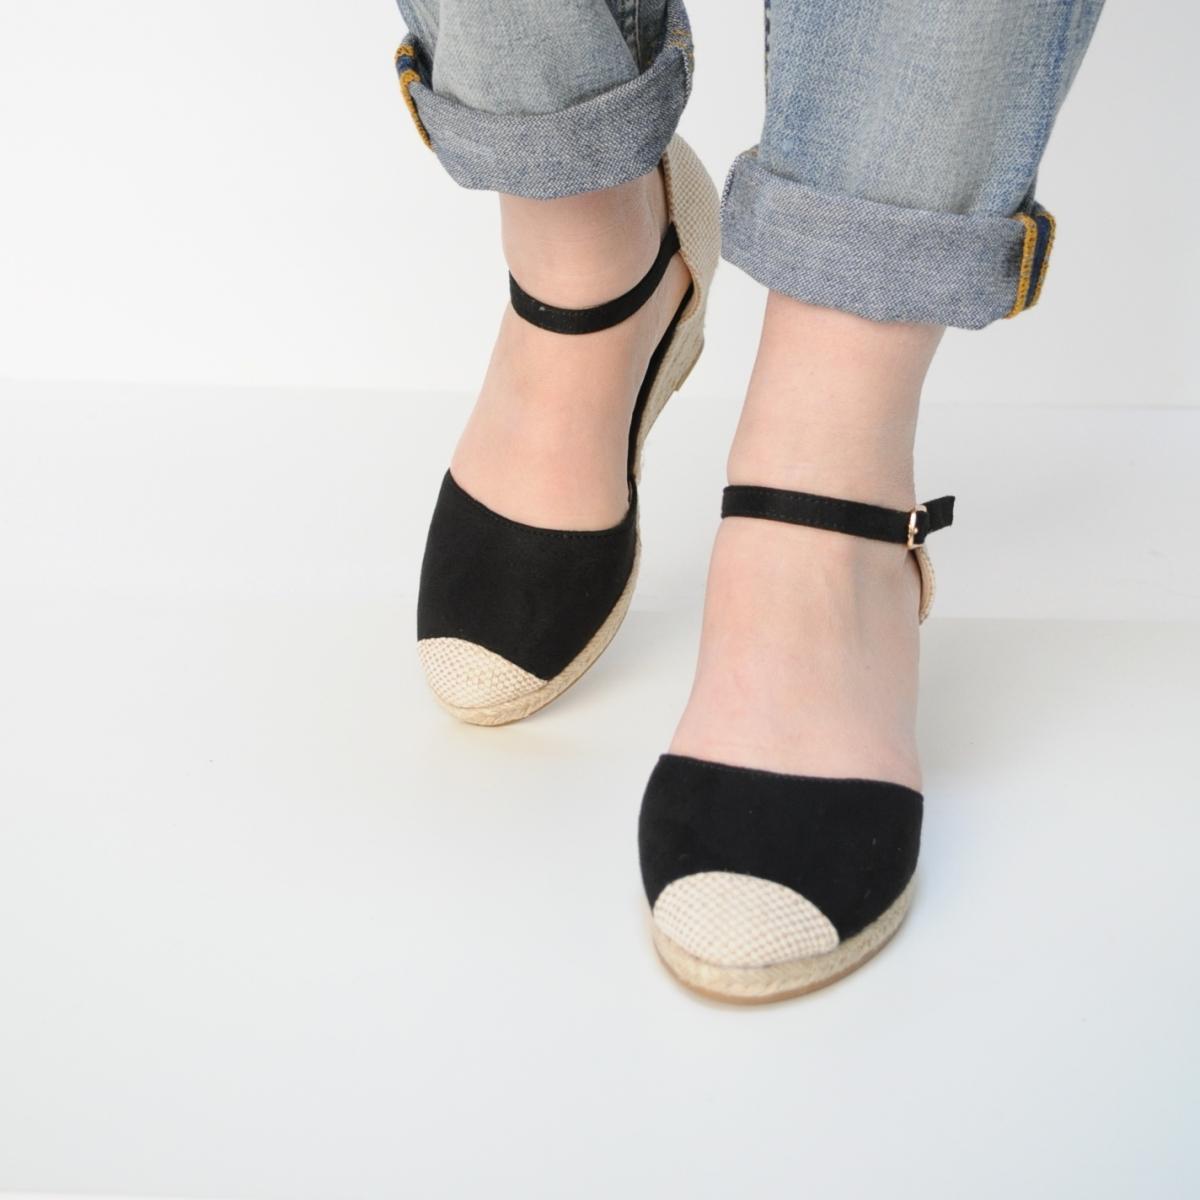 Sandale Erika negre cu platforma